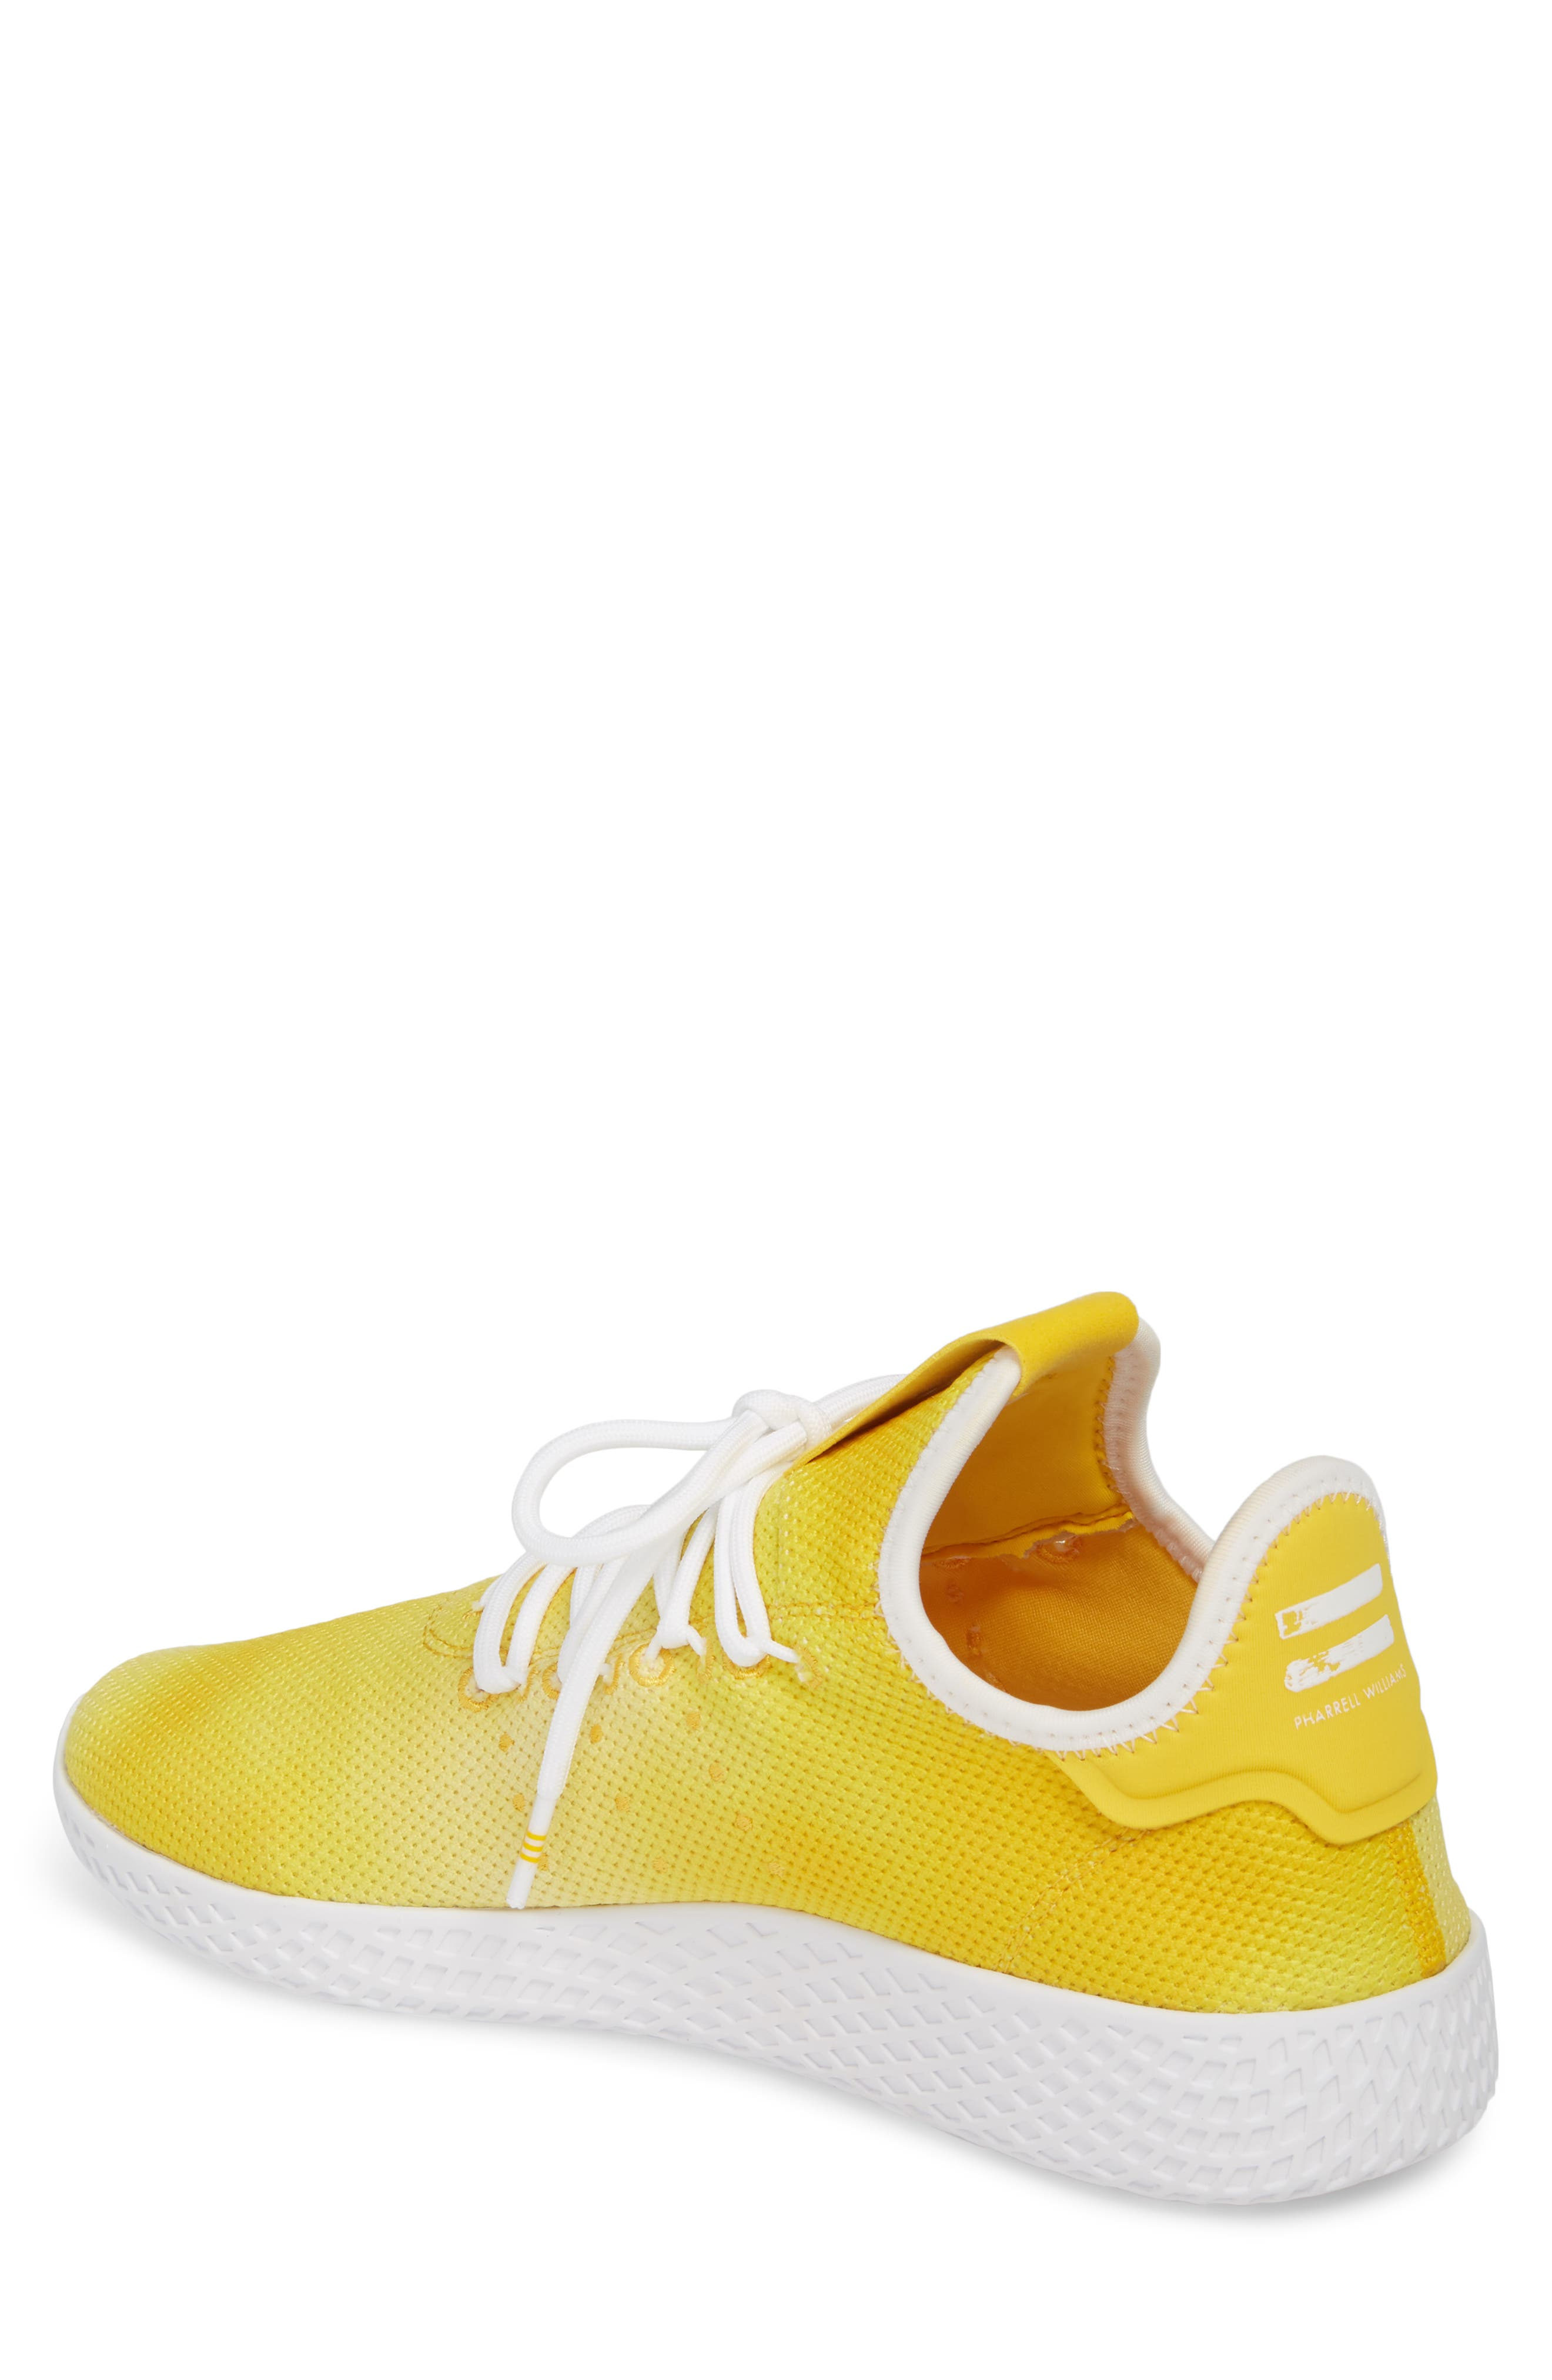 Pharrell Williams Tennis Hu Sneaker,                             Alternate thumbnail 2, color,                             YELLOW/ WHITE